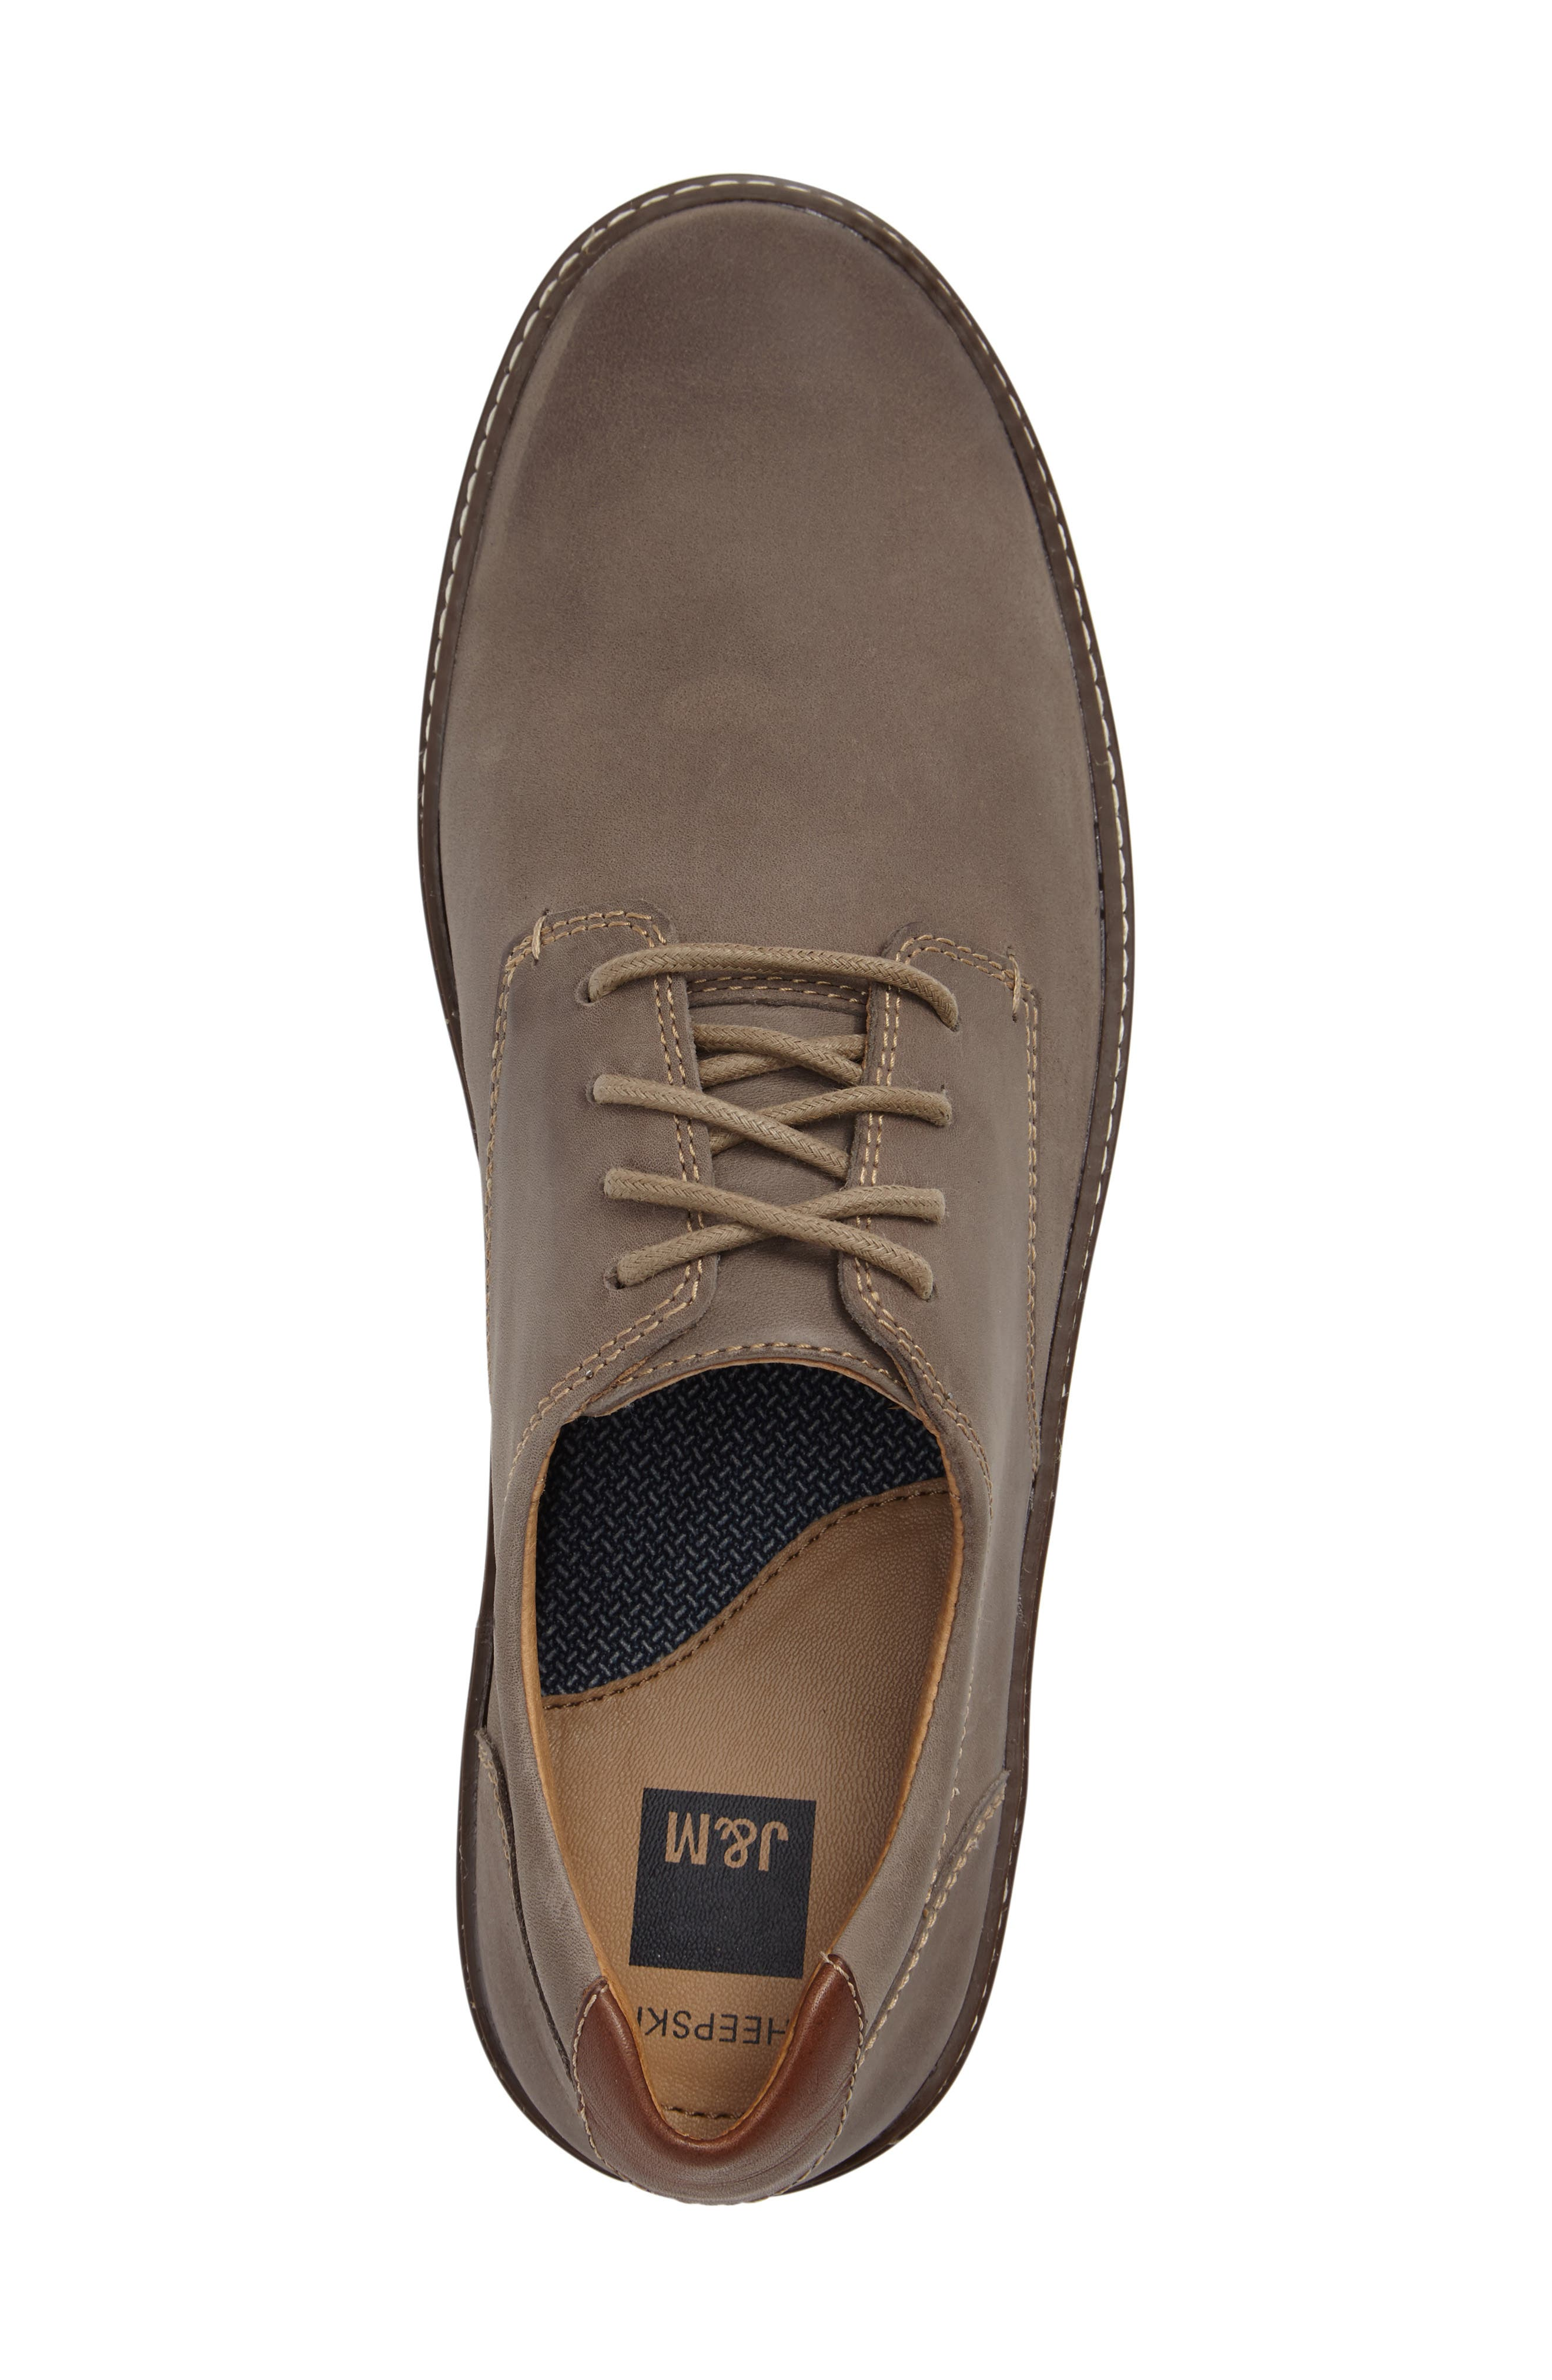 McGuffey Plain Toe Sneaker,                             Alternate thumbnail 3, color,                             GREY NUBUCK LEATHER